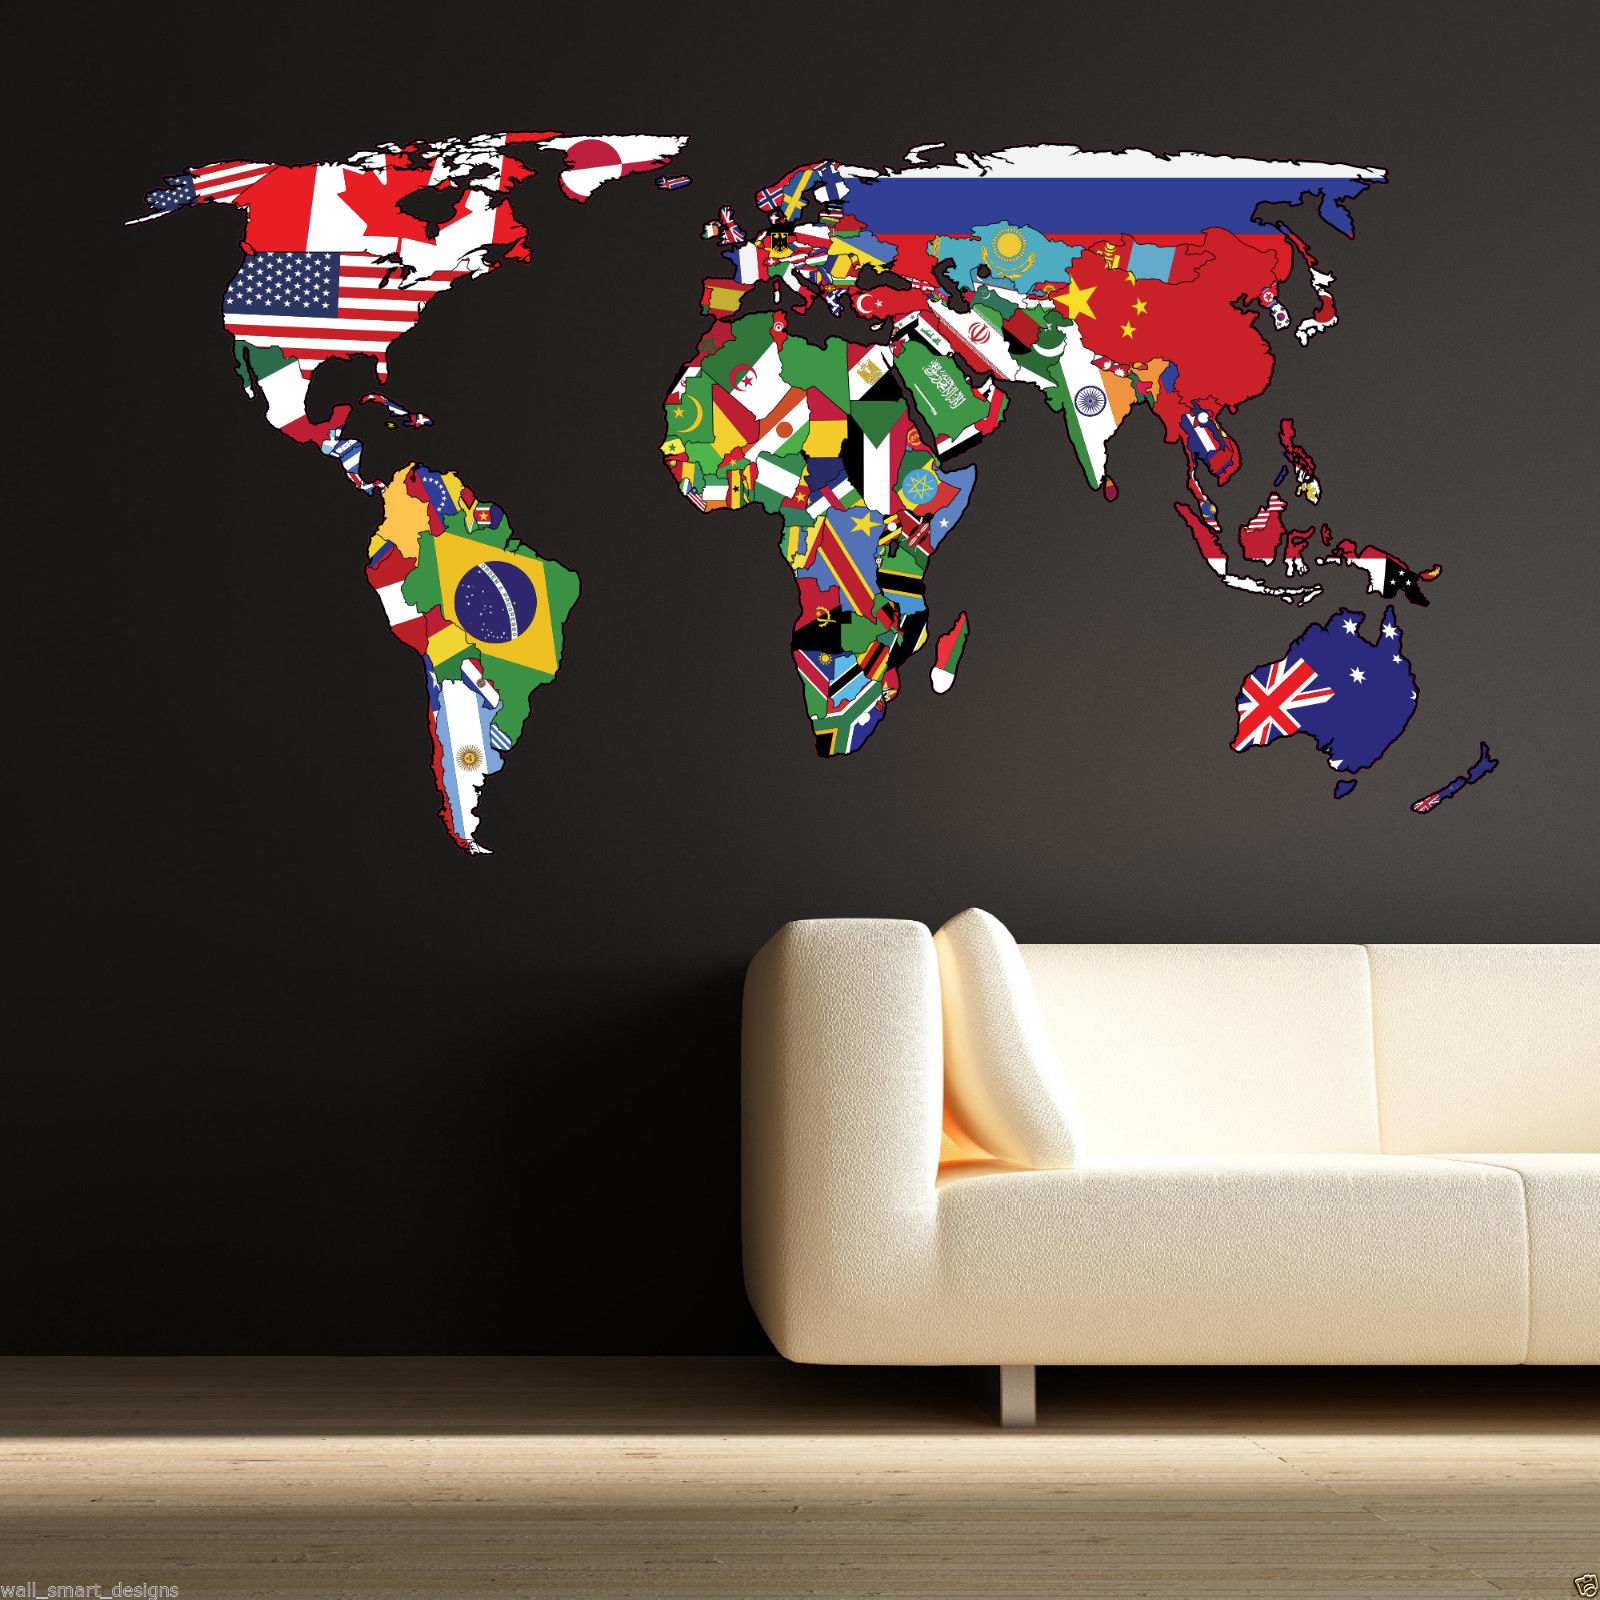 Full Colour World Map Atlas Office Bedroom Wall Art Sticker Decal Mural Transfer